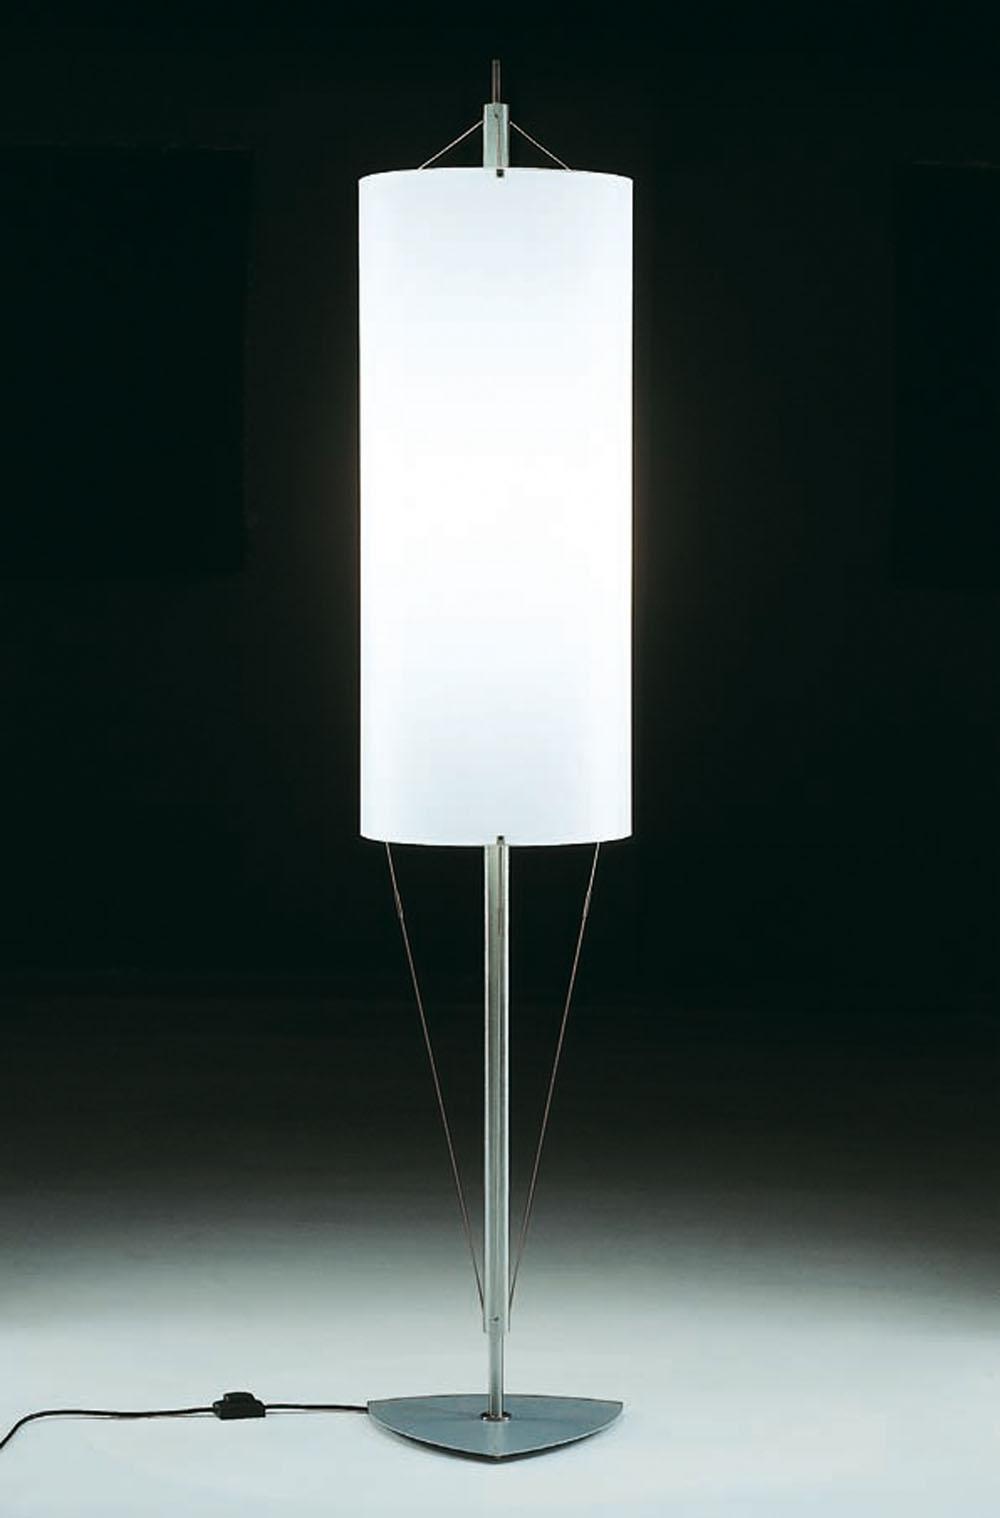 Milan iluminacion pie de salon acero inoxidable 5837 - Iluminacion lamparas de pie ...